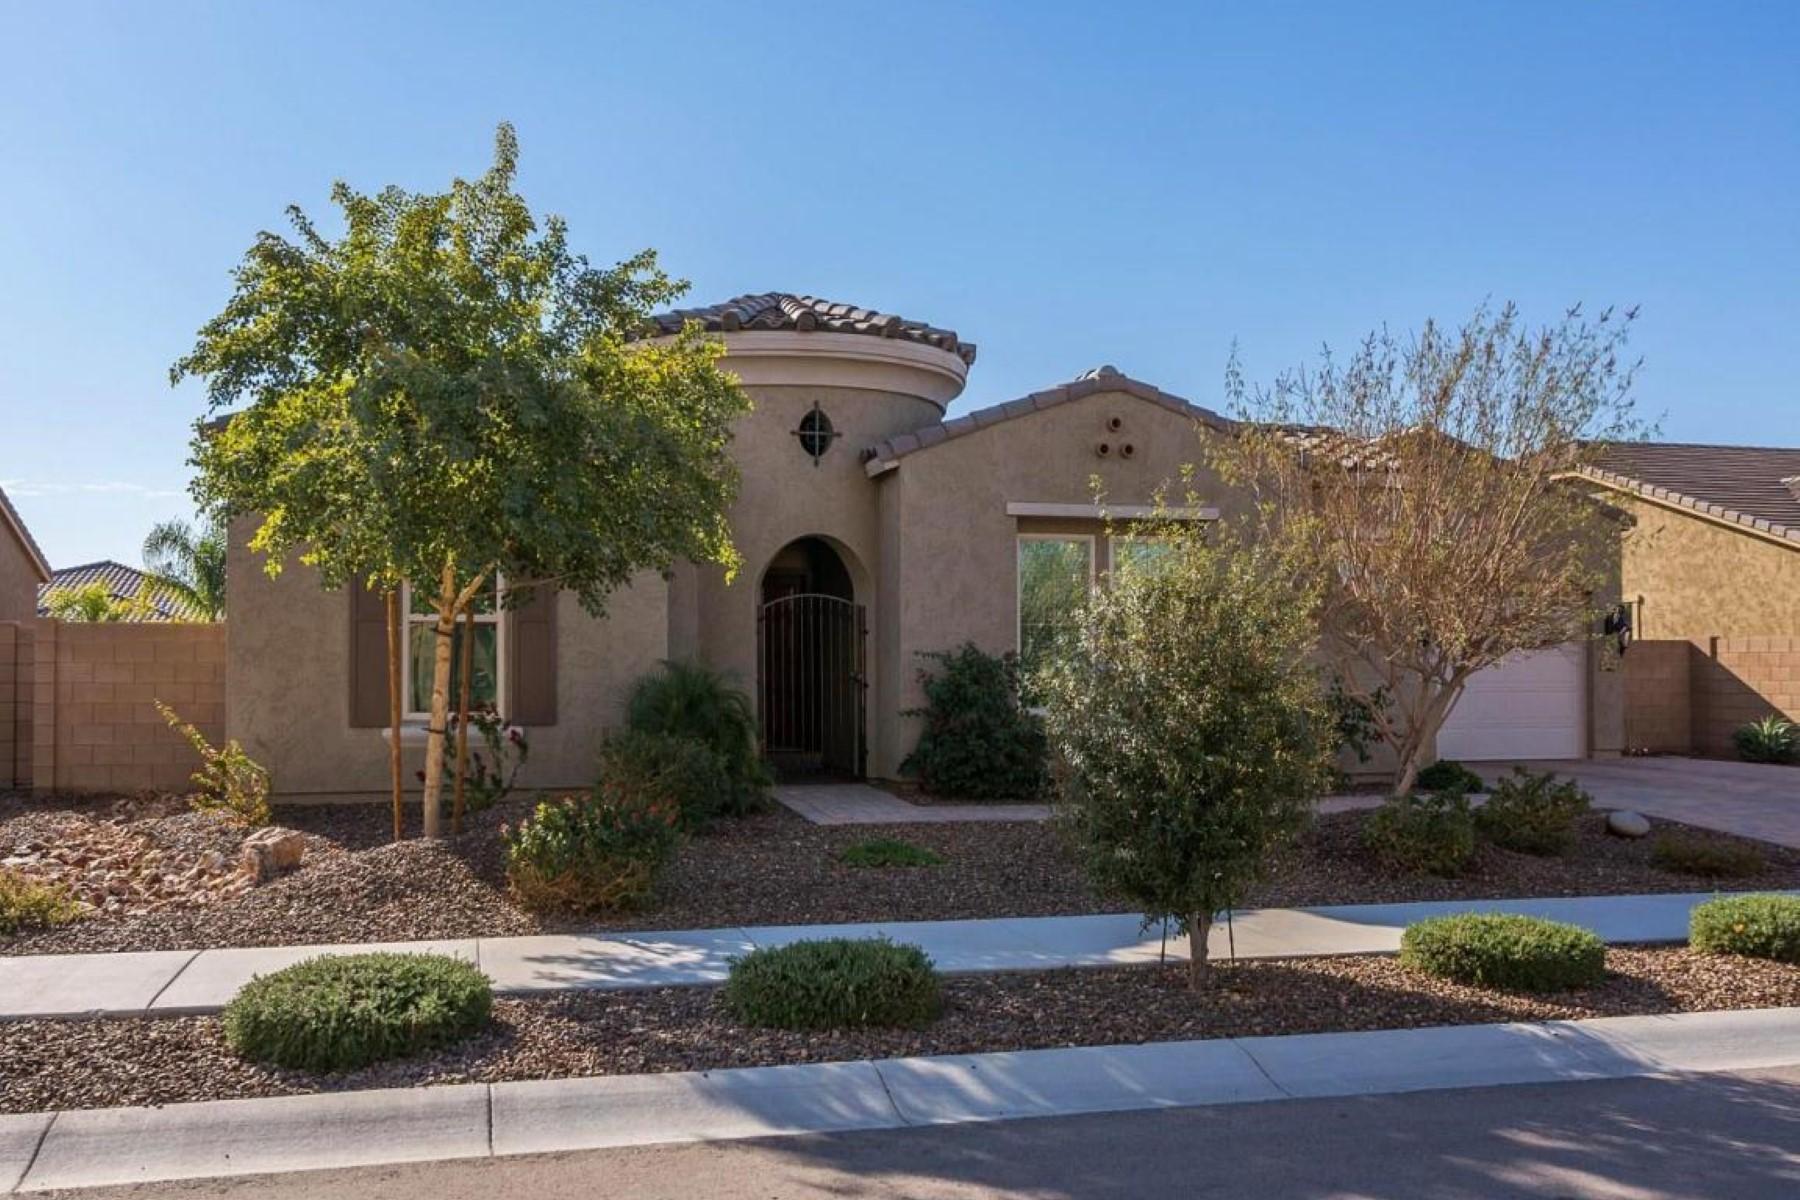 獨棟家庭住宅 為 出售 在 Beautiful single level home 20117 E Quintero Rd Queen Creek, 亞利桑那州, 85142 美國